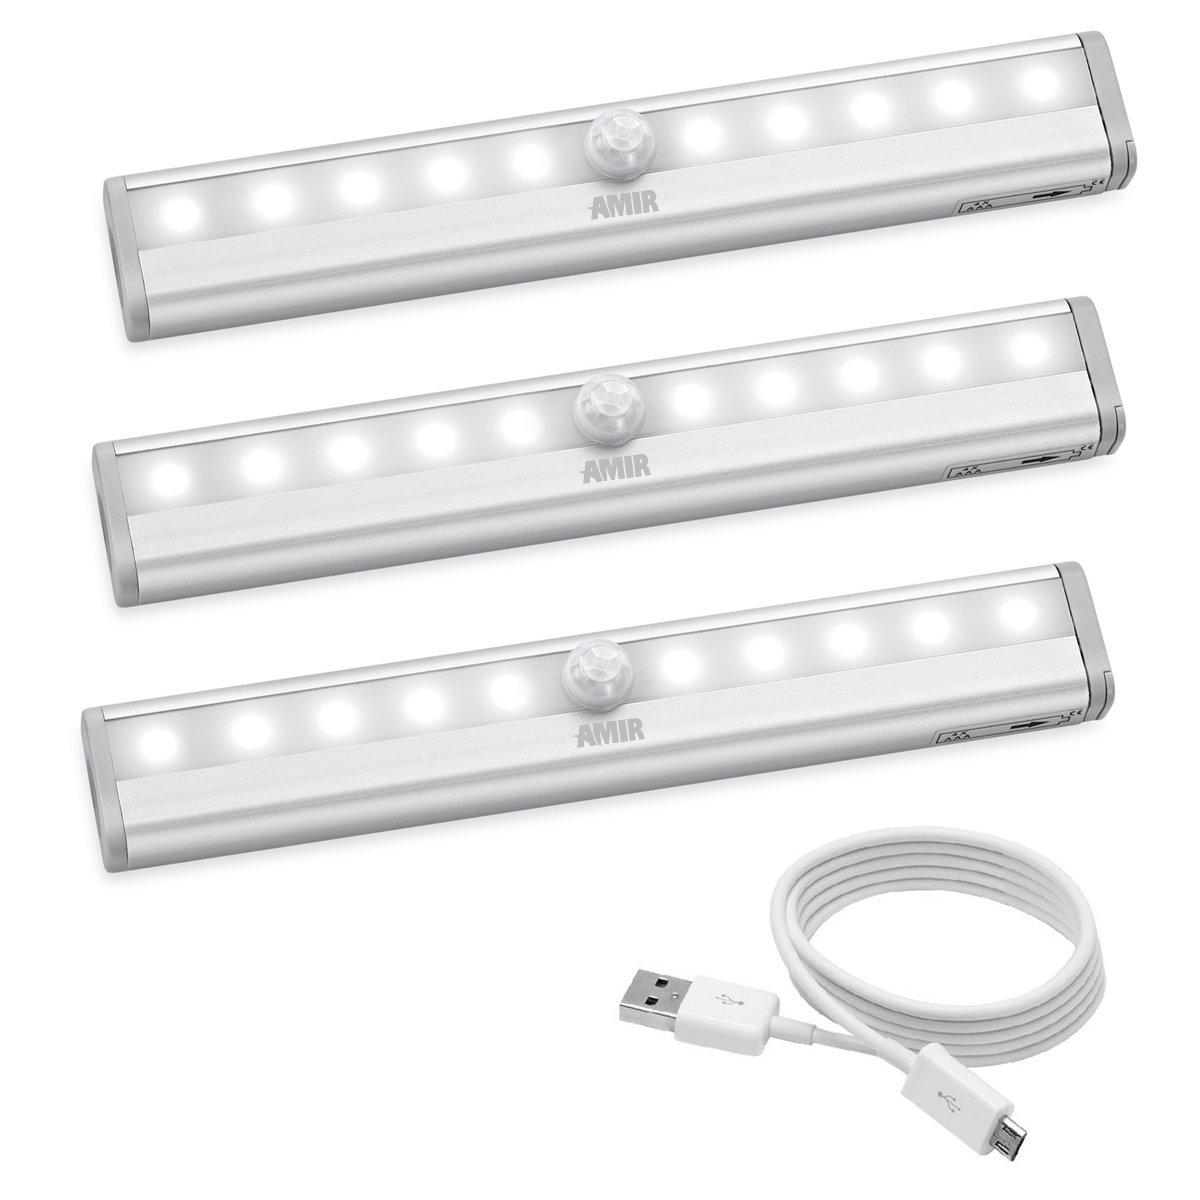 Amir 10 LEDモーション検知クローゼットライト 10 LED UF17_3PCS Motion Sensor Lights B072R22HSG 11619 ホワイト ホワイト